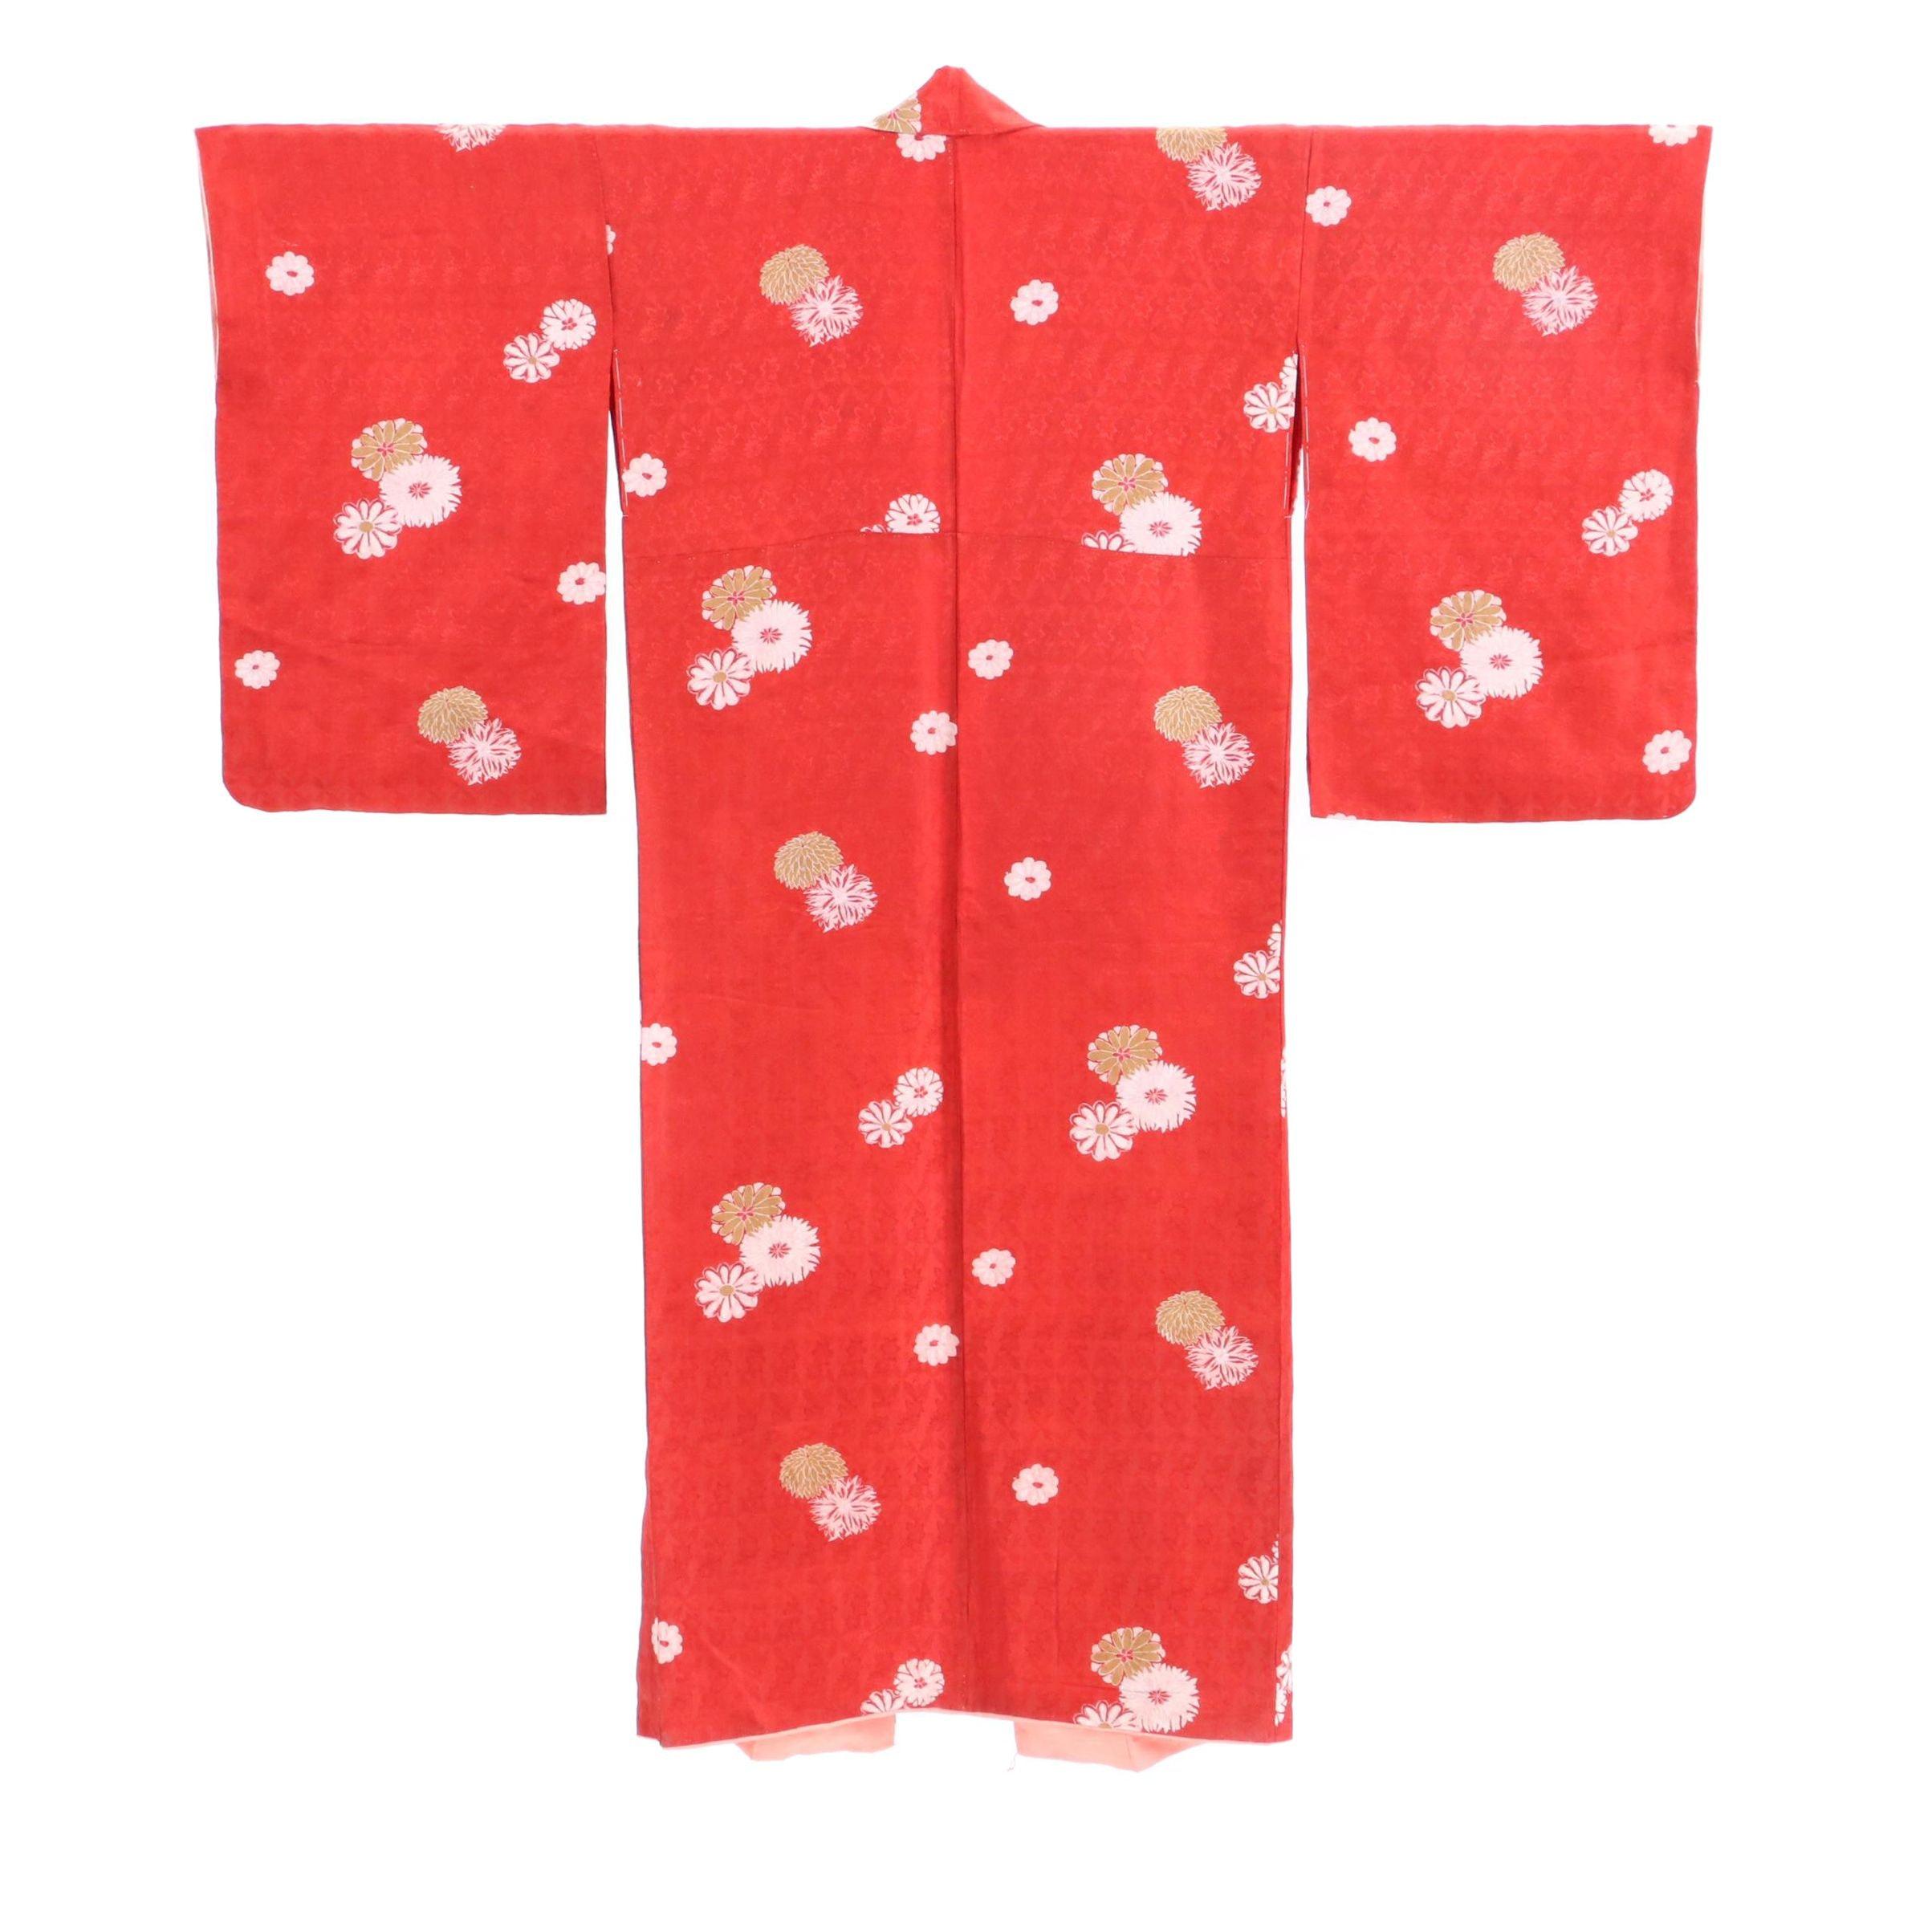 Circa 1920s Vintage Japanese Rinzu Silk Damask Komon Kimono